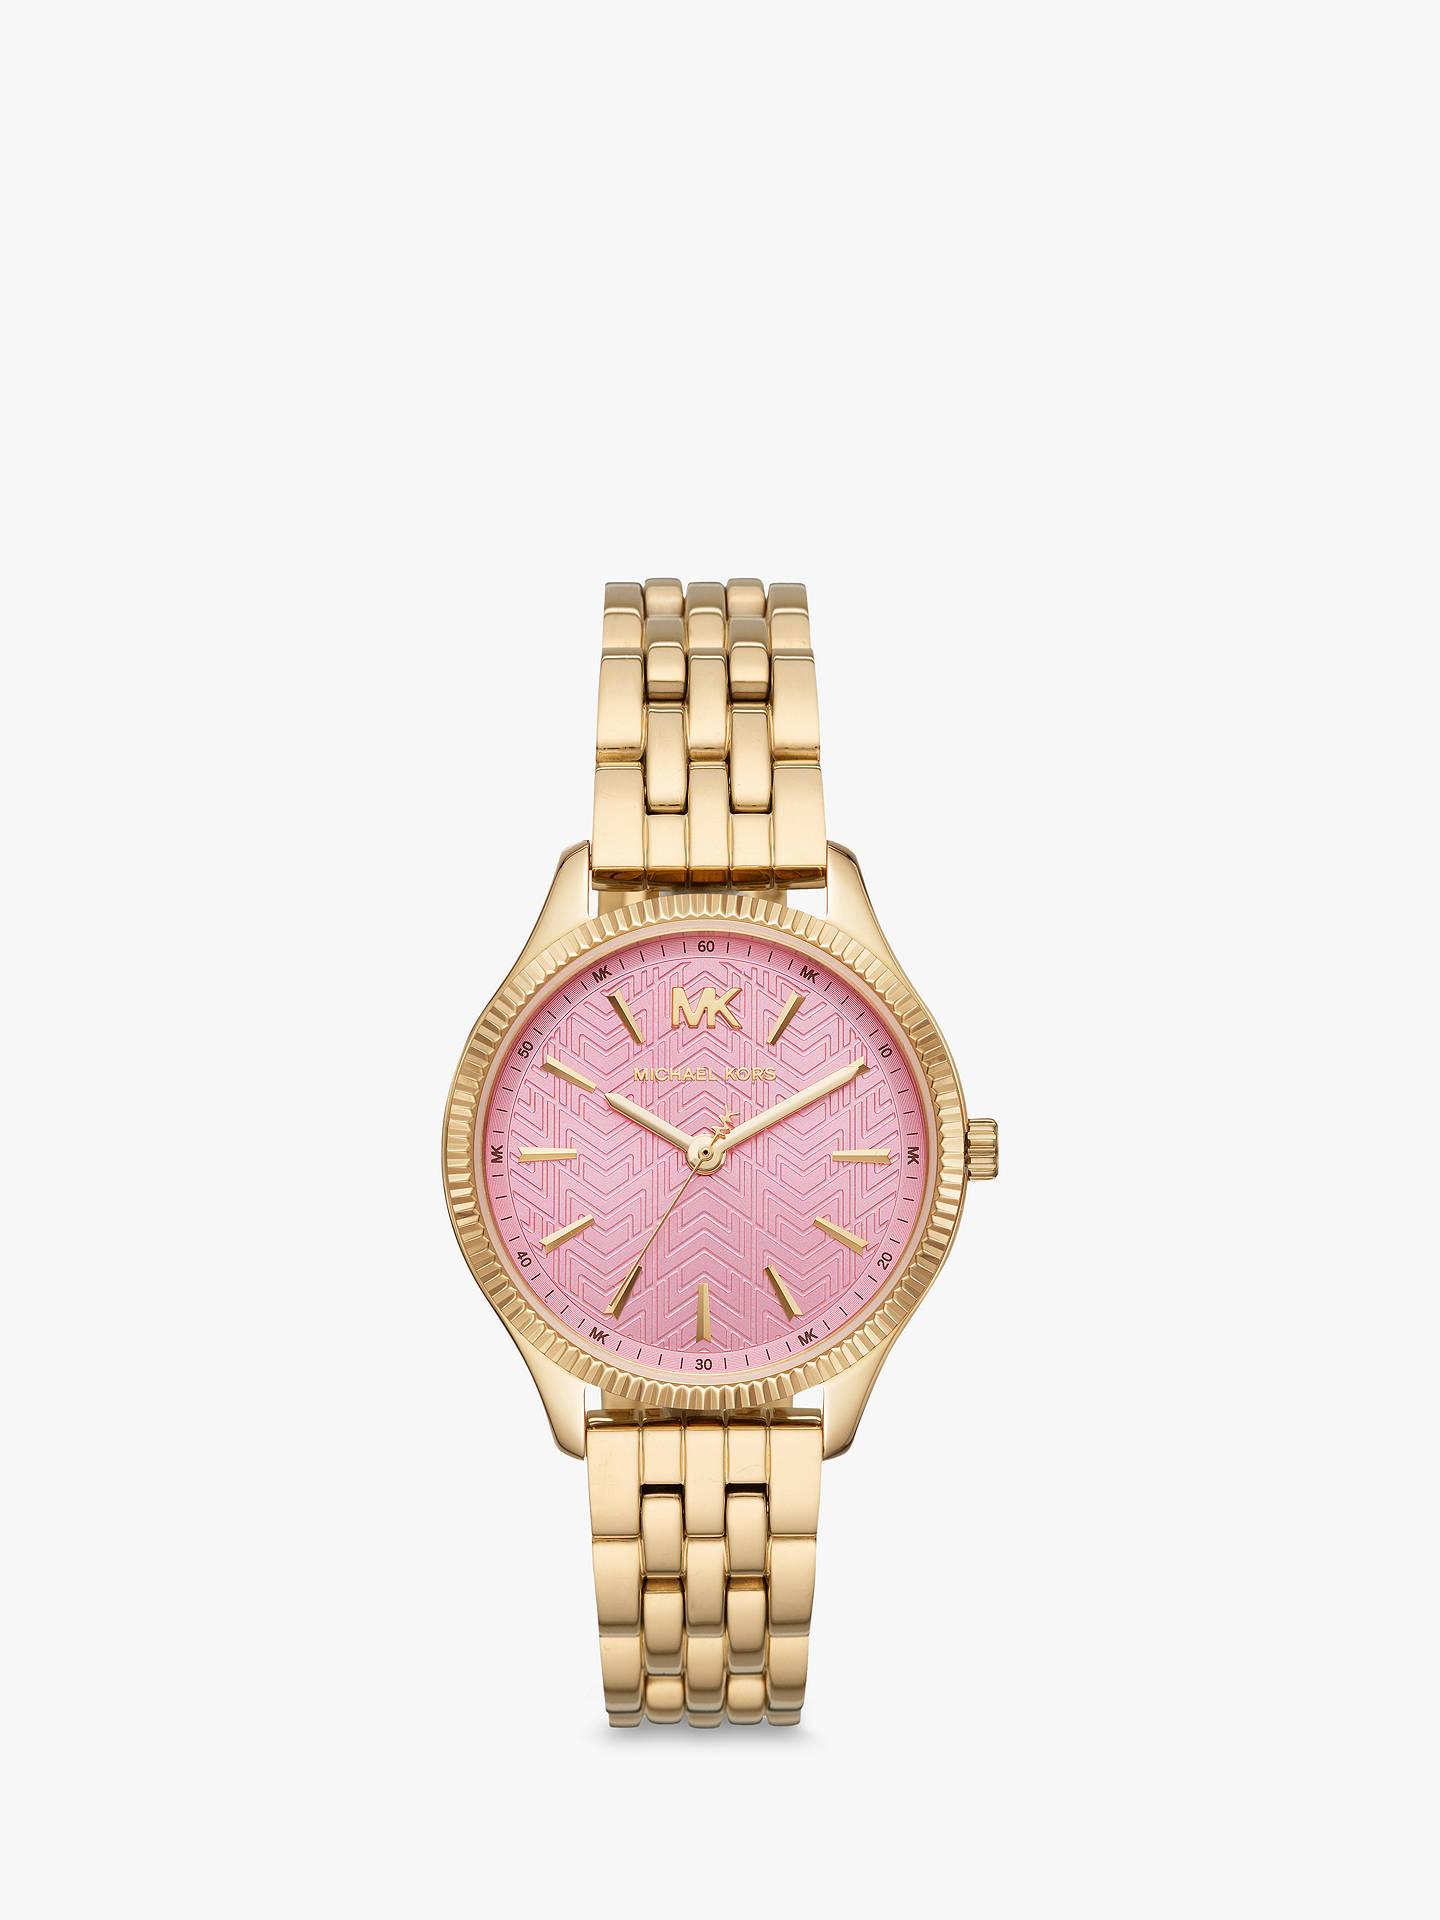 166486d31f23 Michael Kors Women s Lexington Bracelet Strap Watch at John Lewis ...